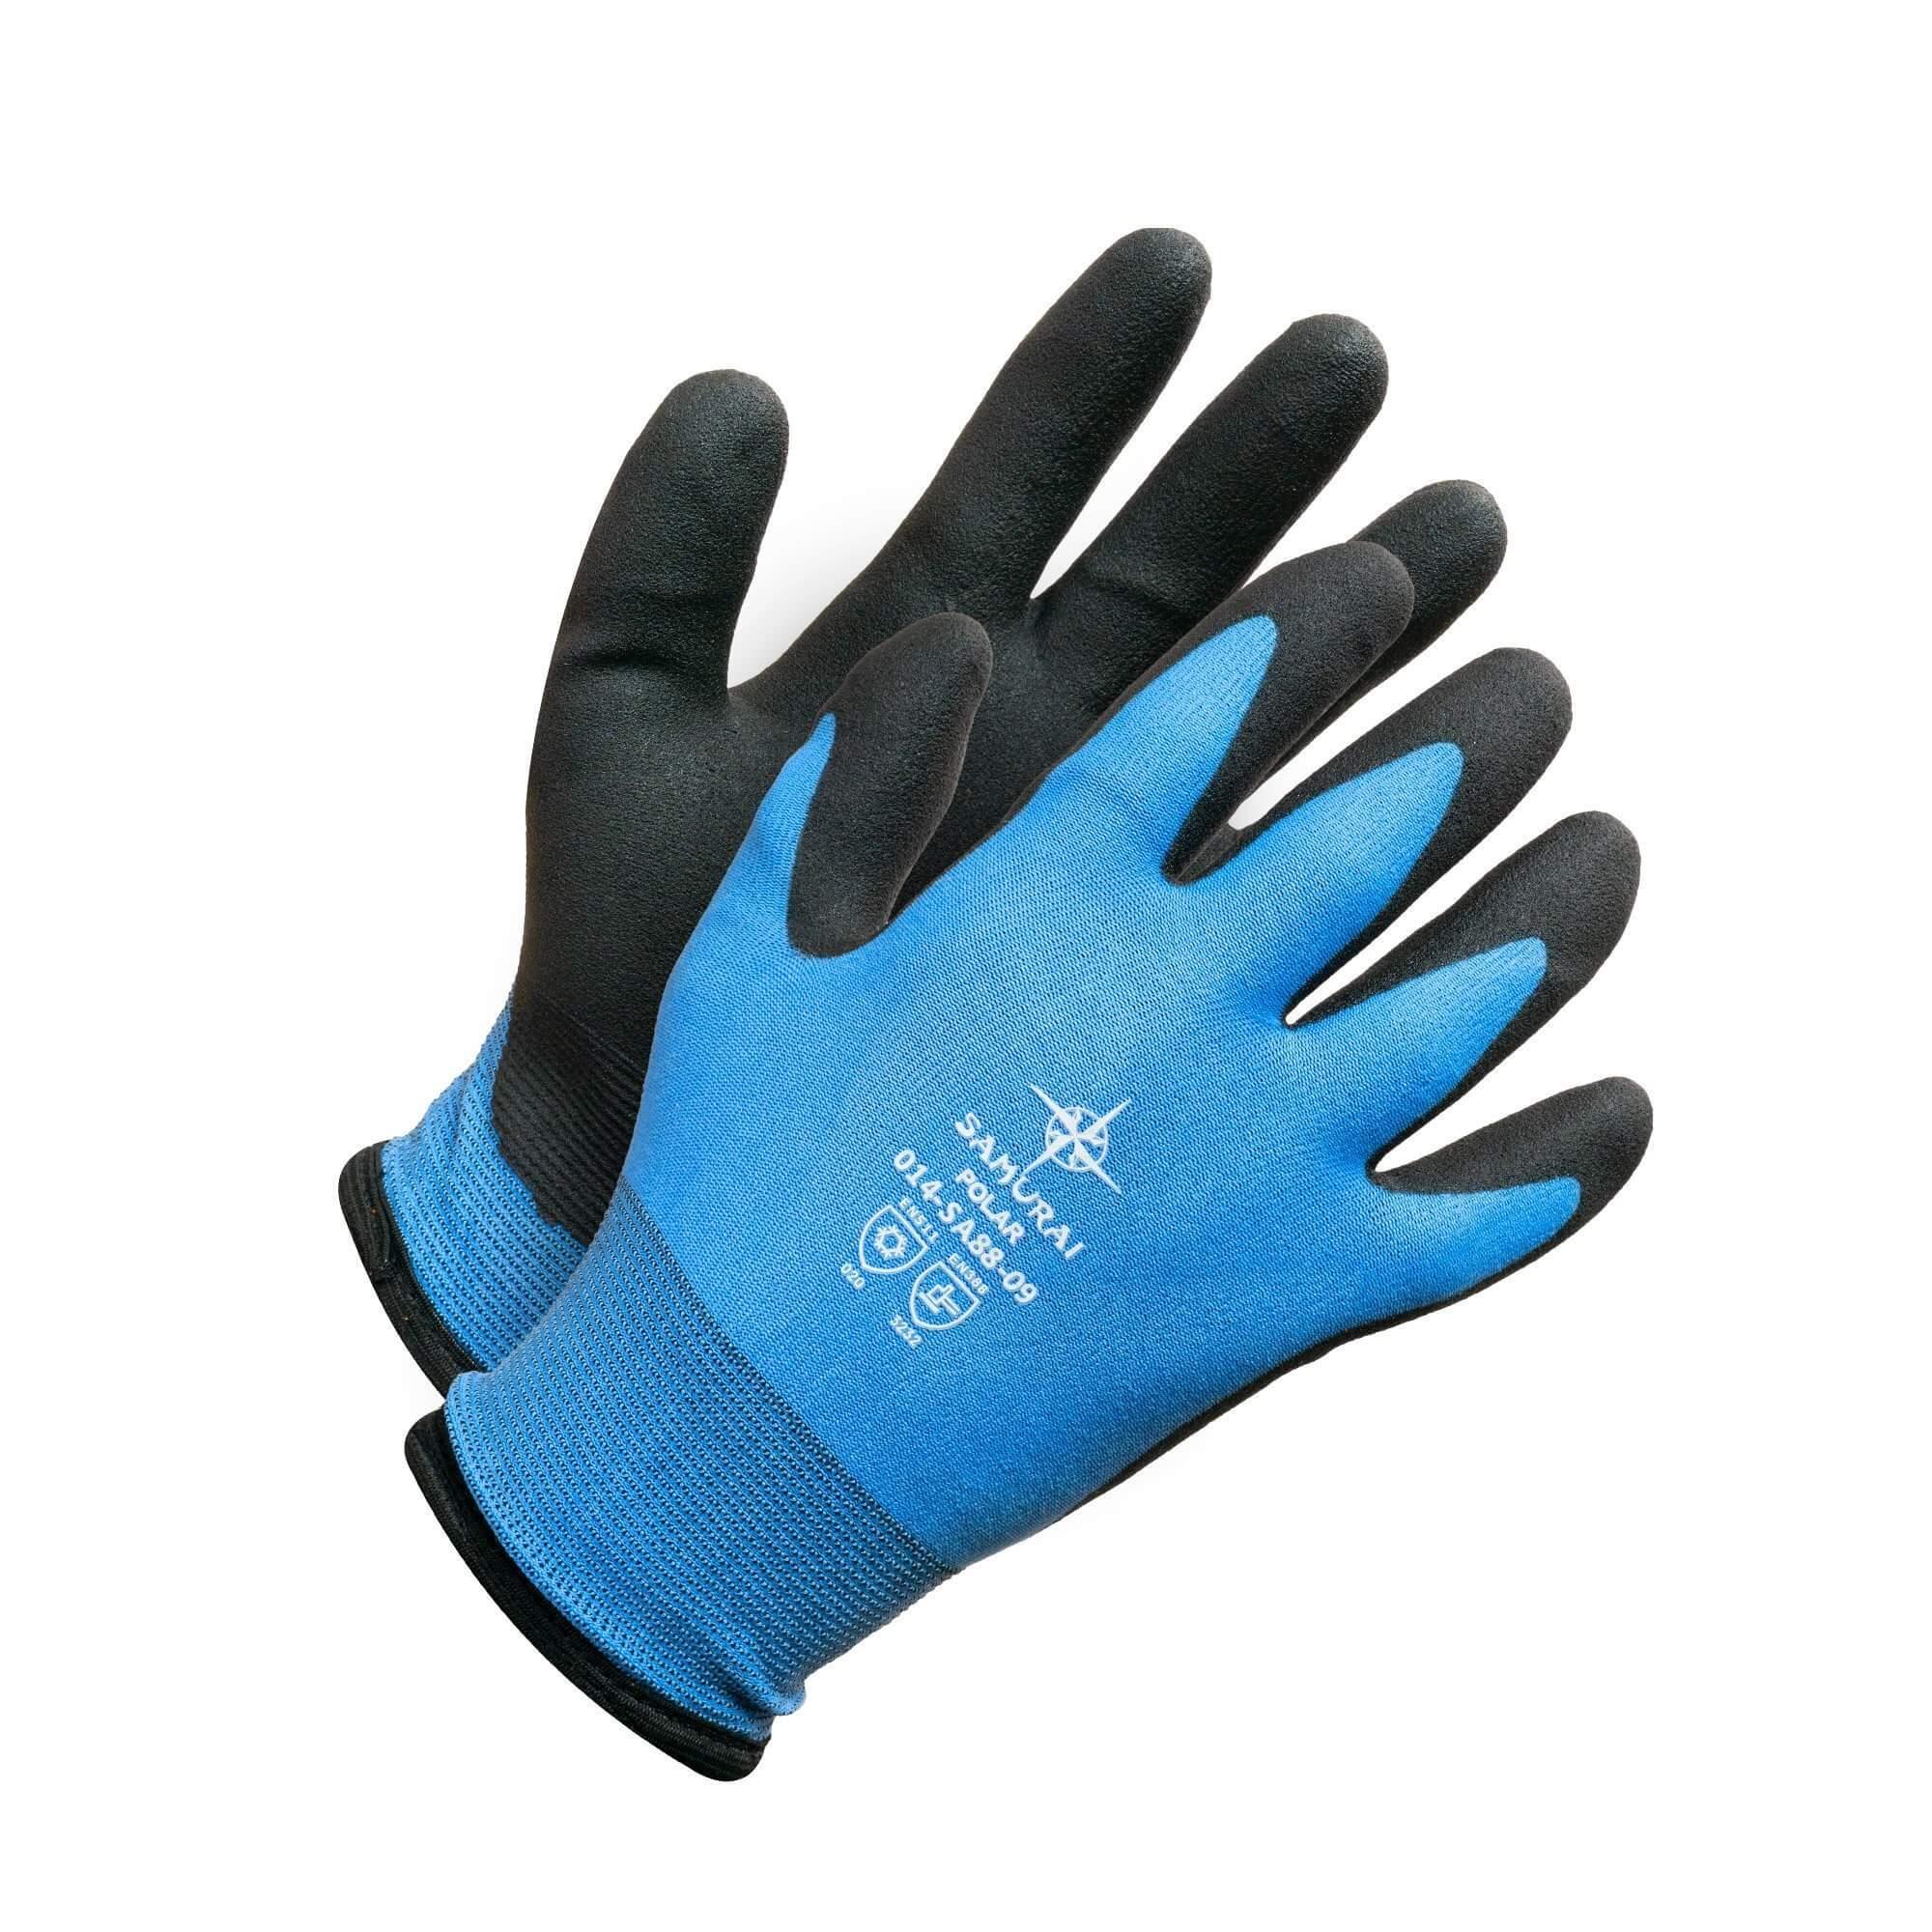 Glove - Samurai Polar PVC Coated - Lined - Large